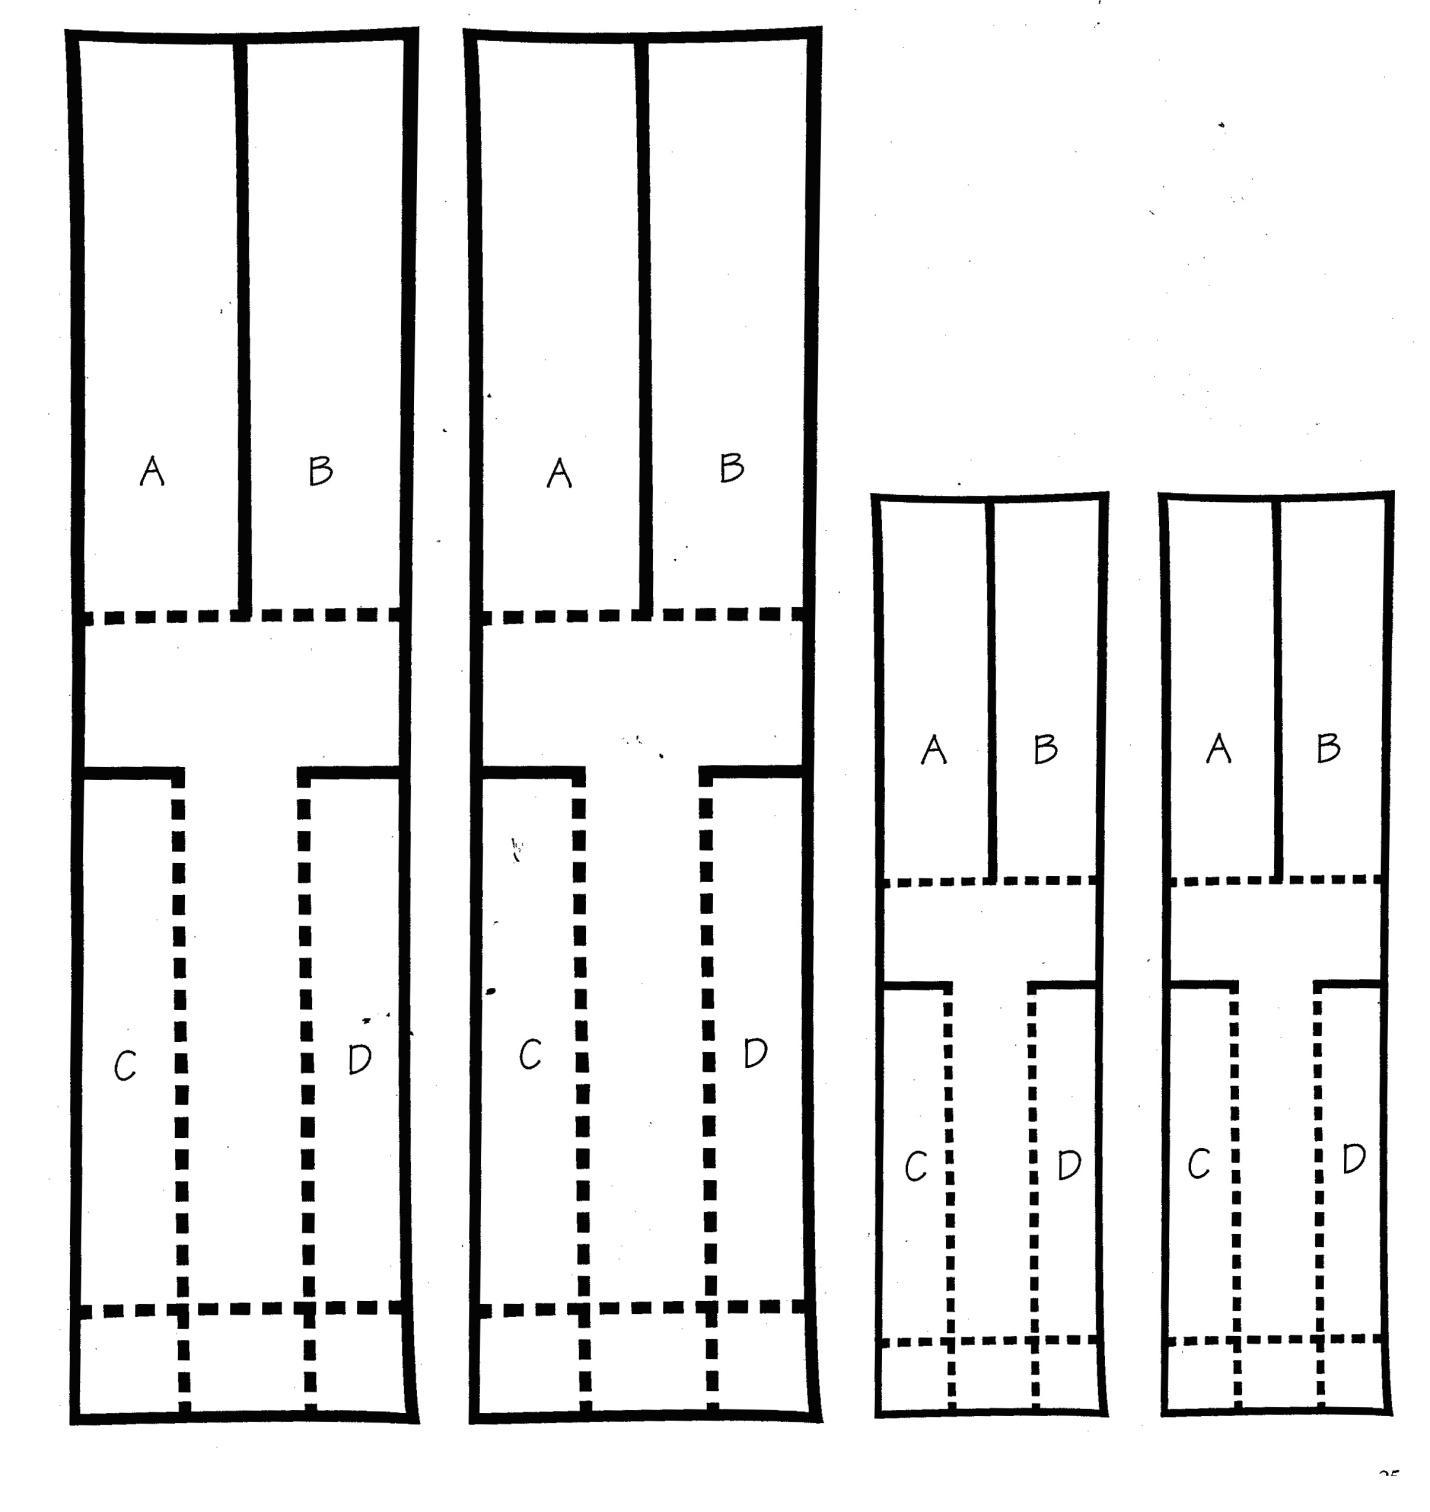 Description: Seed Dispersal template copy